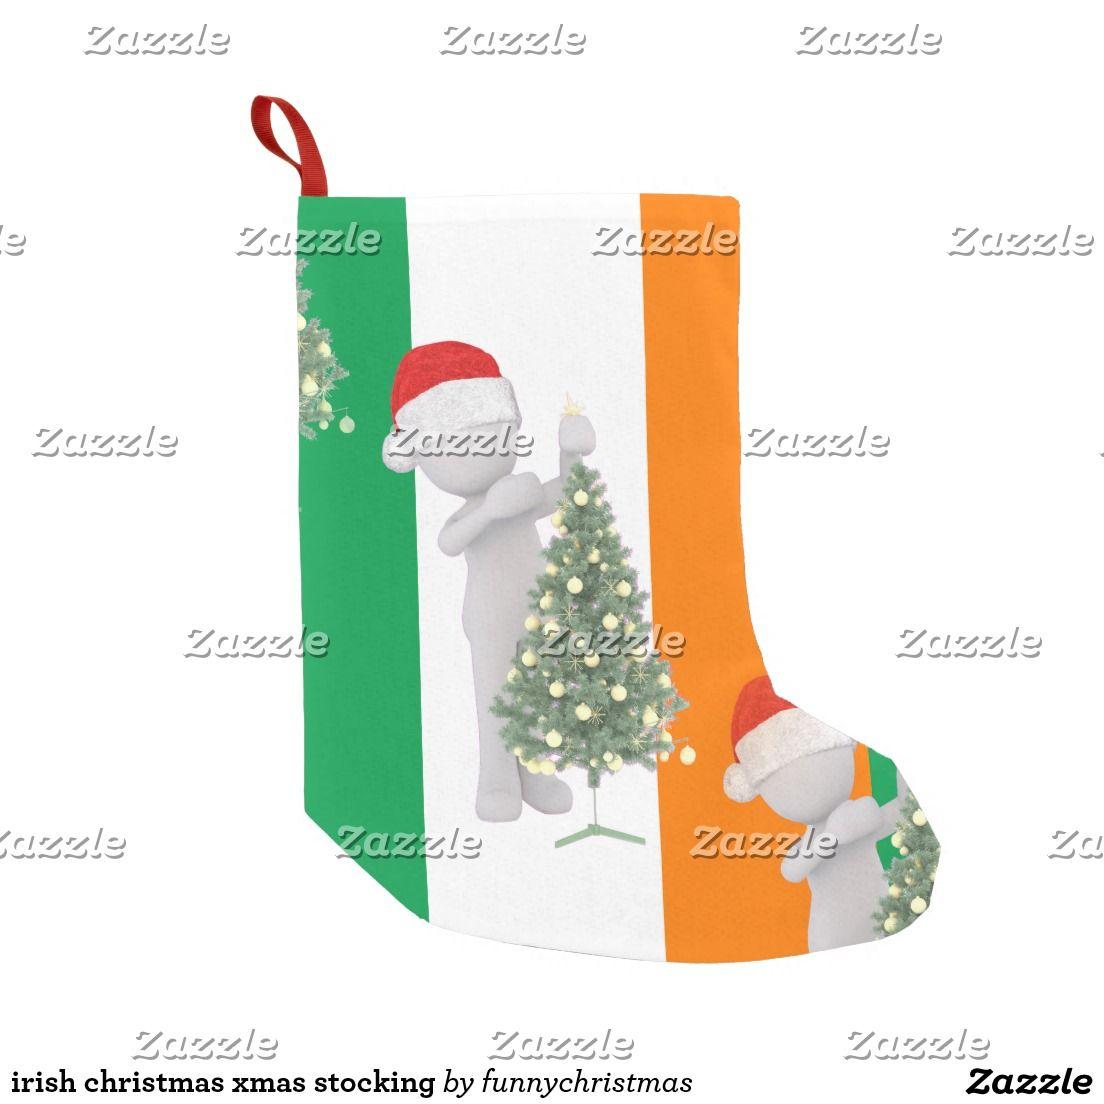 Irish christmas xmas stocking | Pinterest